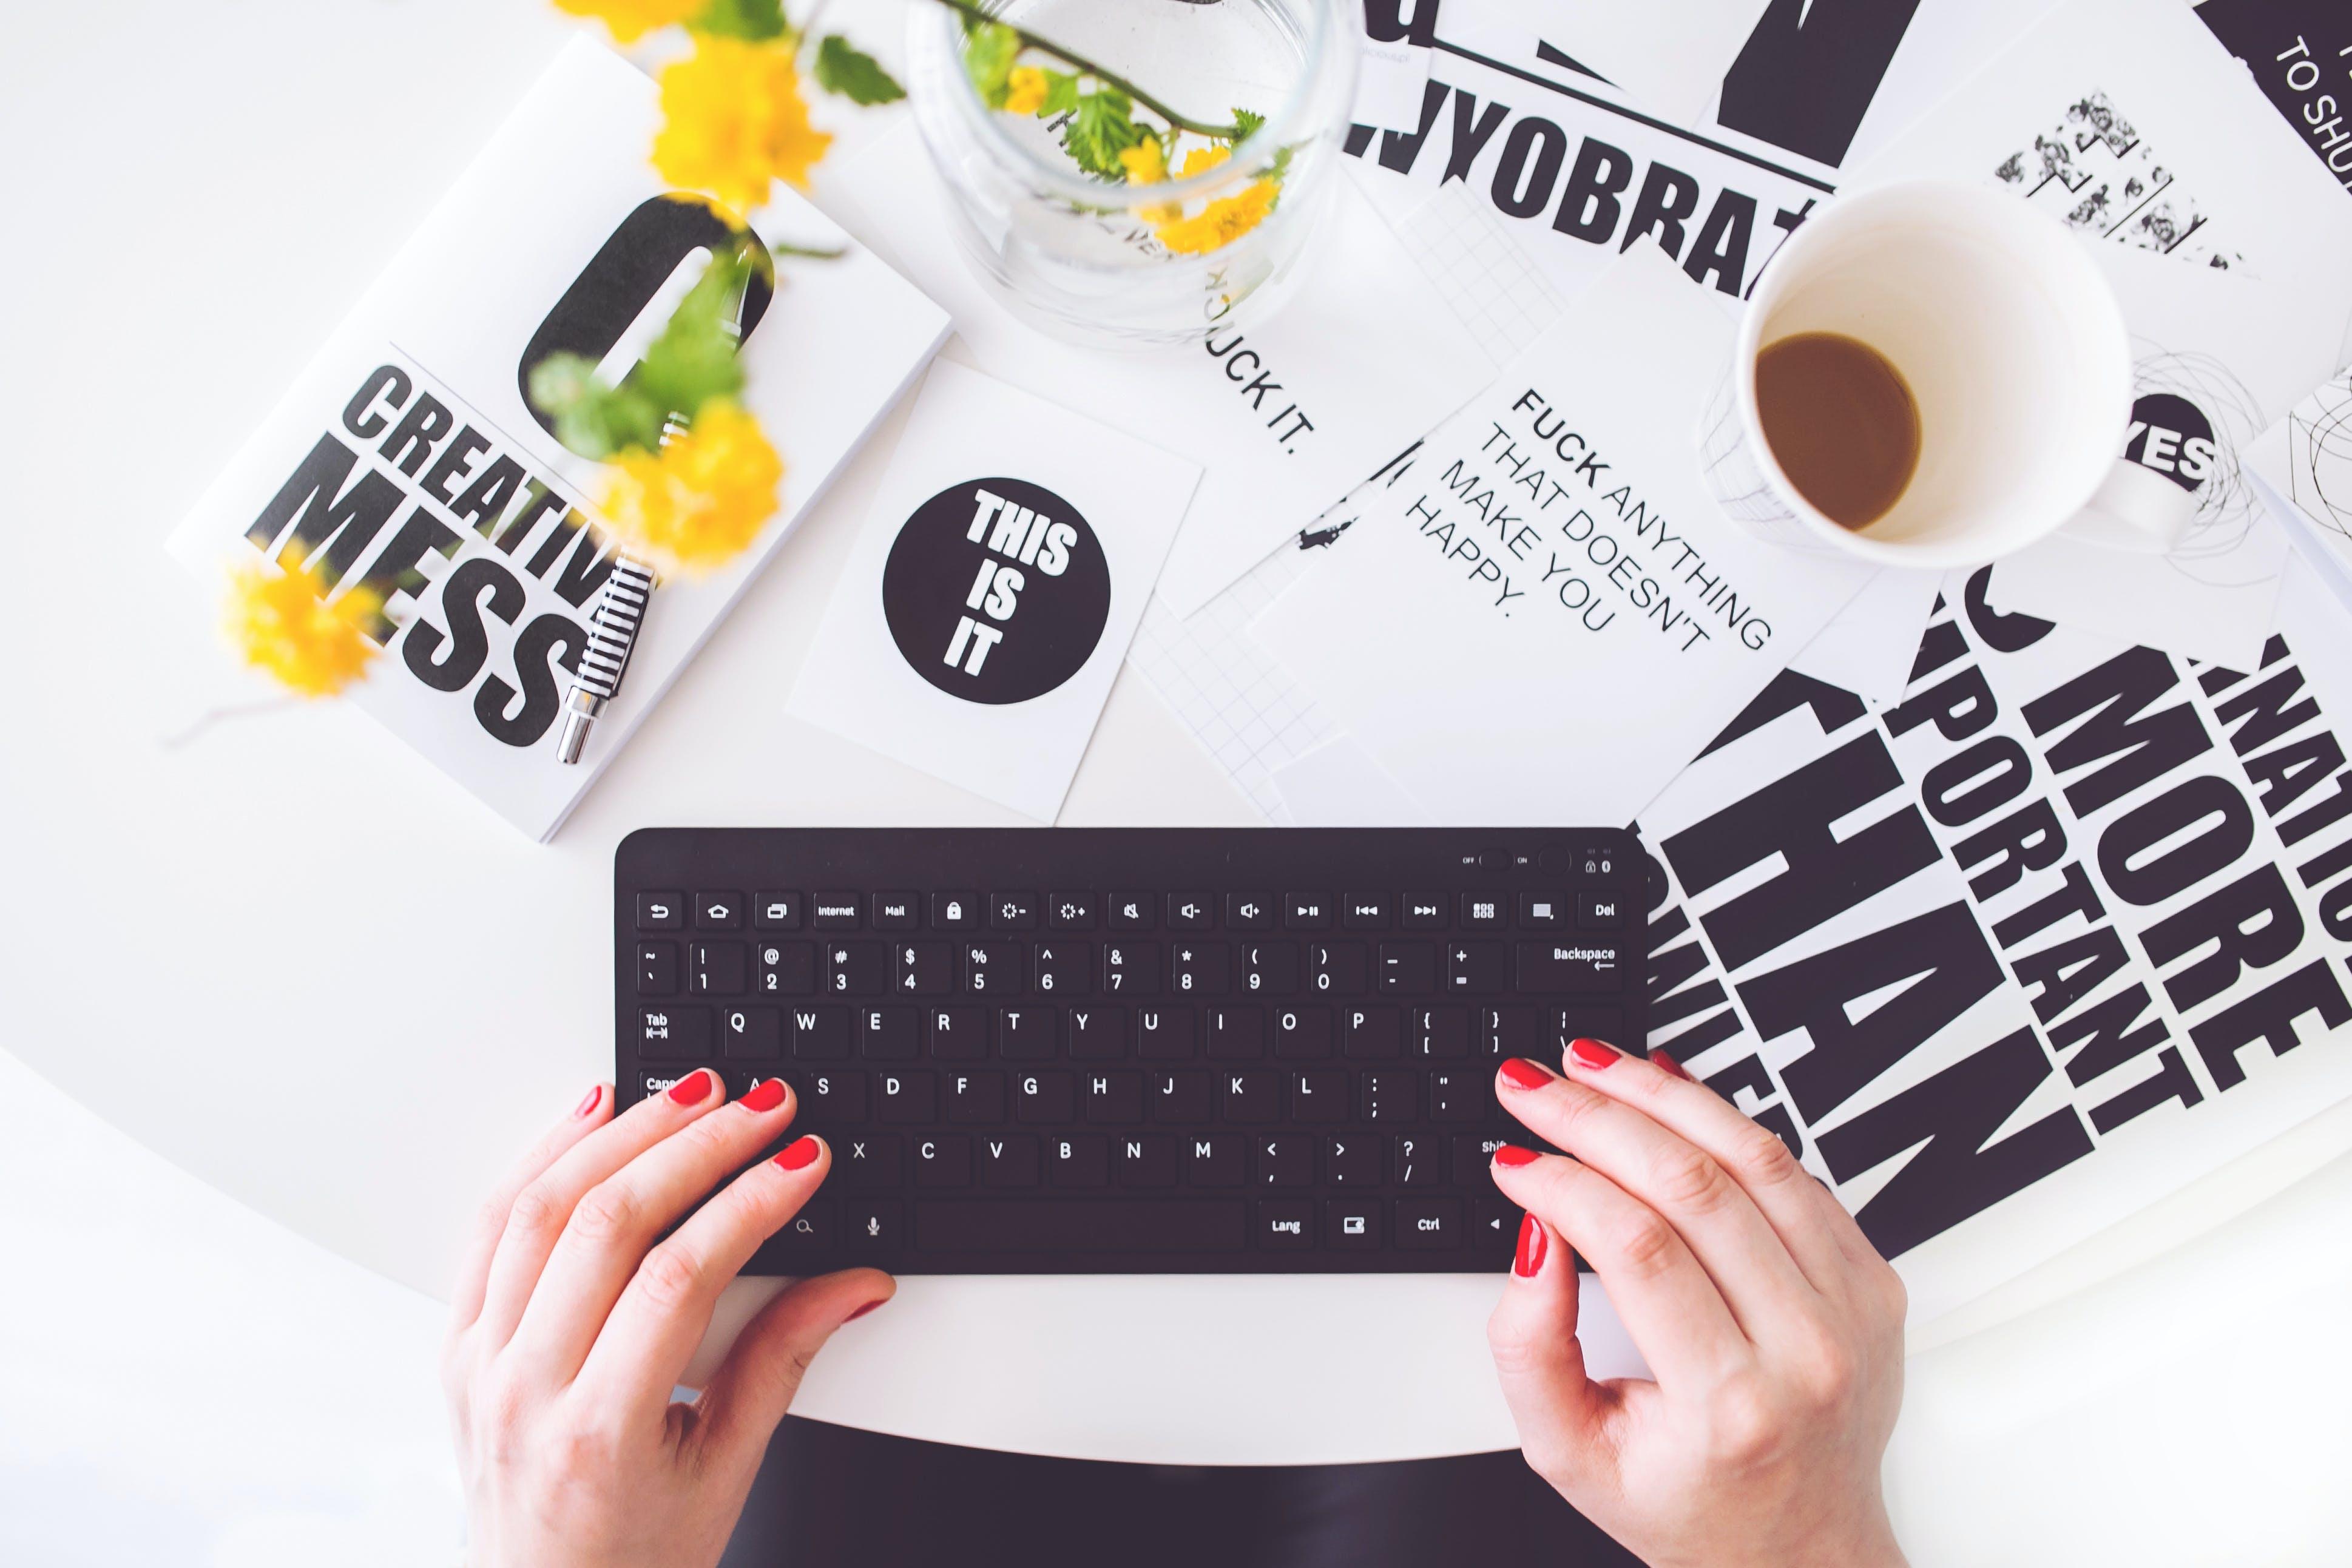 Blogs & Redes Sociais